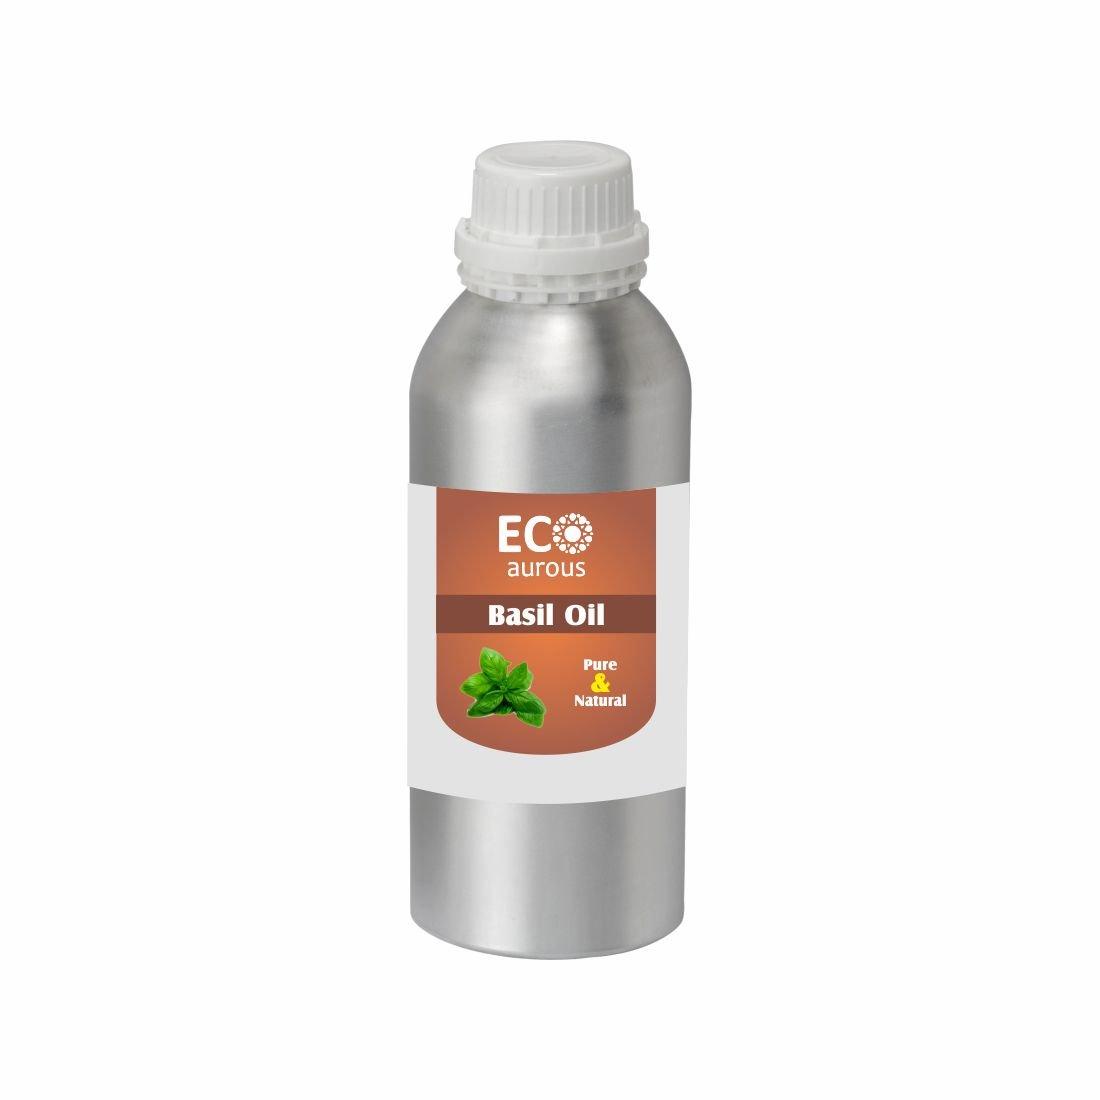 Eco Aurous Basil Oil (Holy Basil Oil) Pure & Natural Essential Oil | Basil Essential Oil | Tulsi Oil | Tulsi Ras | Tulsi Tel | Pure Basil Oil | Indian Basil Oil (10ml (0.33 oz)) Tosc International Pvt. Ltd.